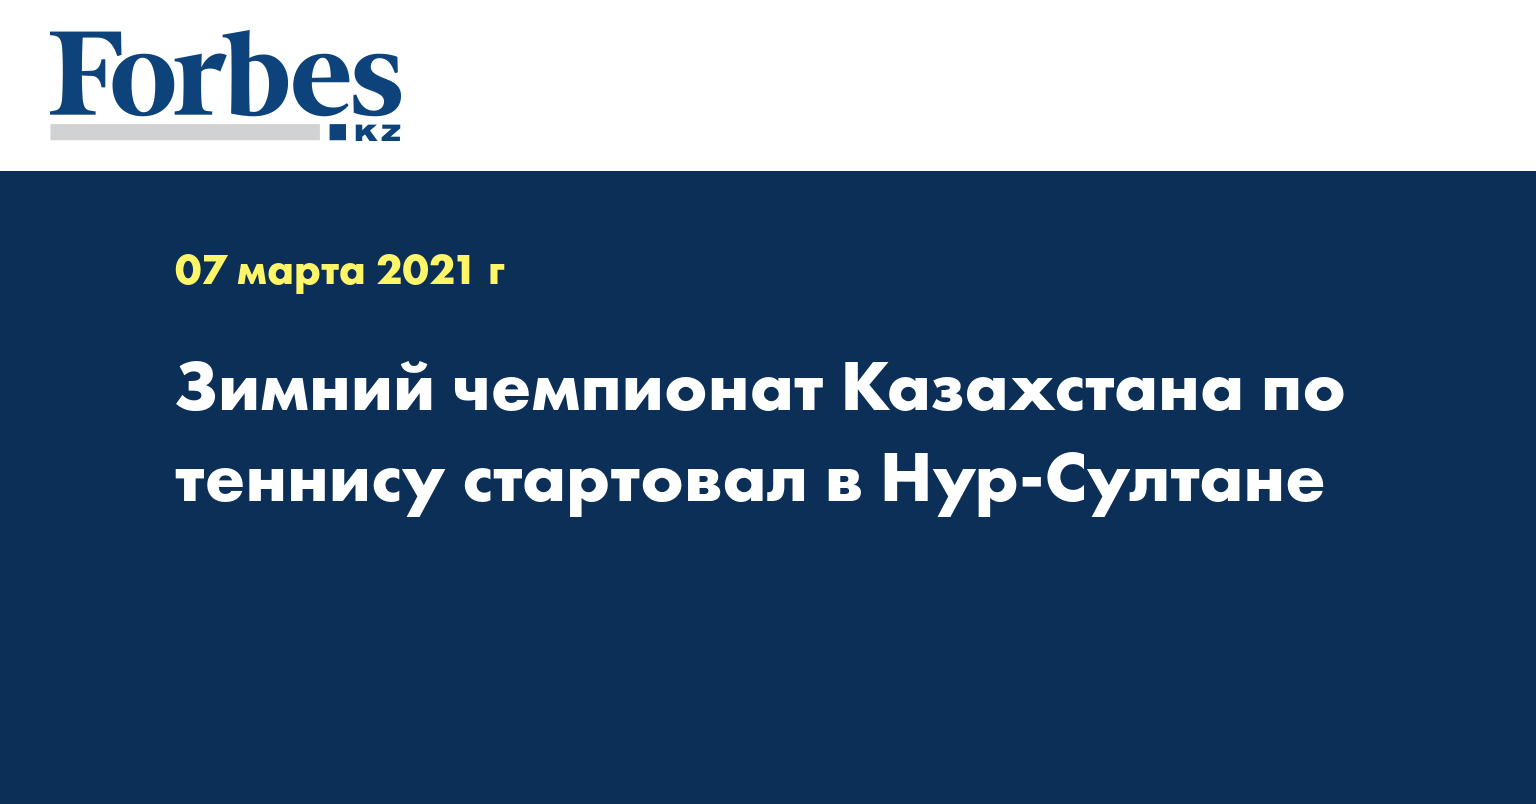 Зимний чемпионат Казахстана по теннису стартовал в Нур-Султане